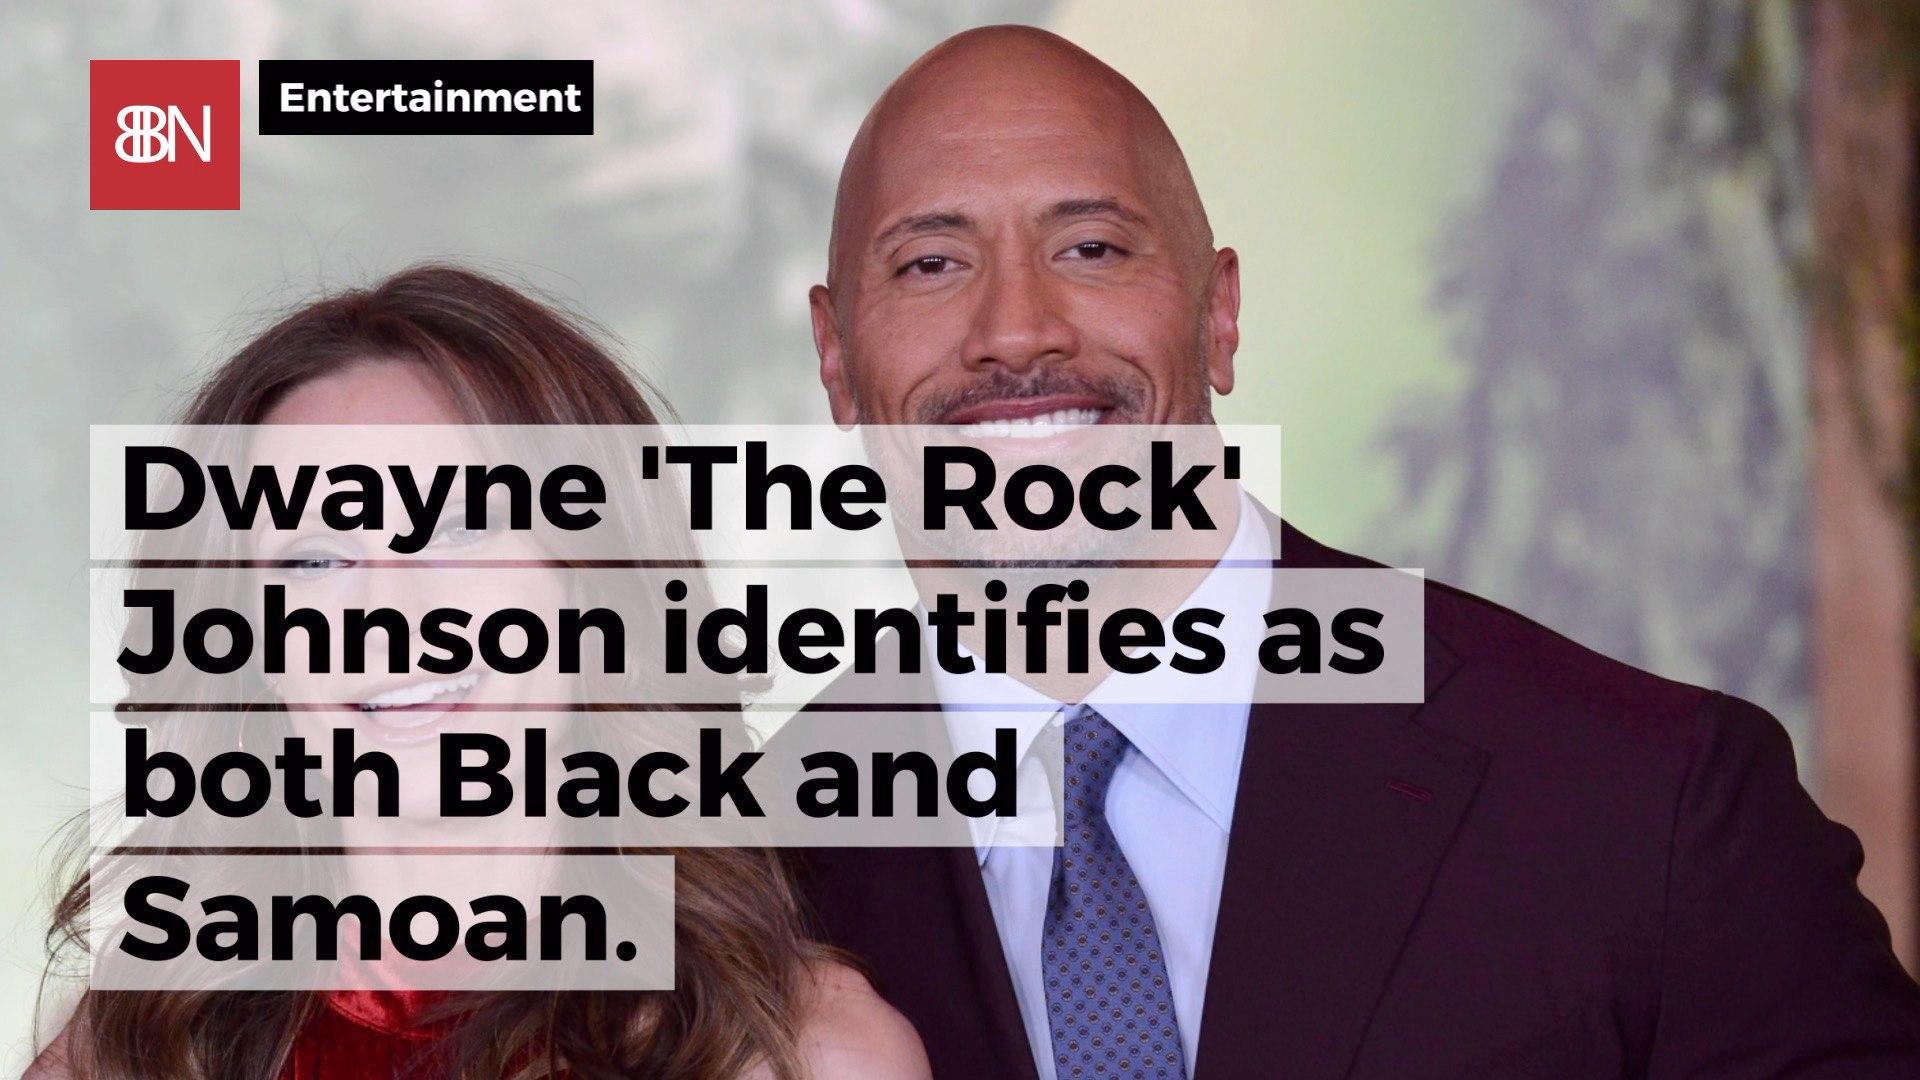 Dwayne Johnson Identifies Himself In 2 Important Ways